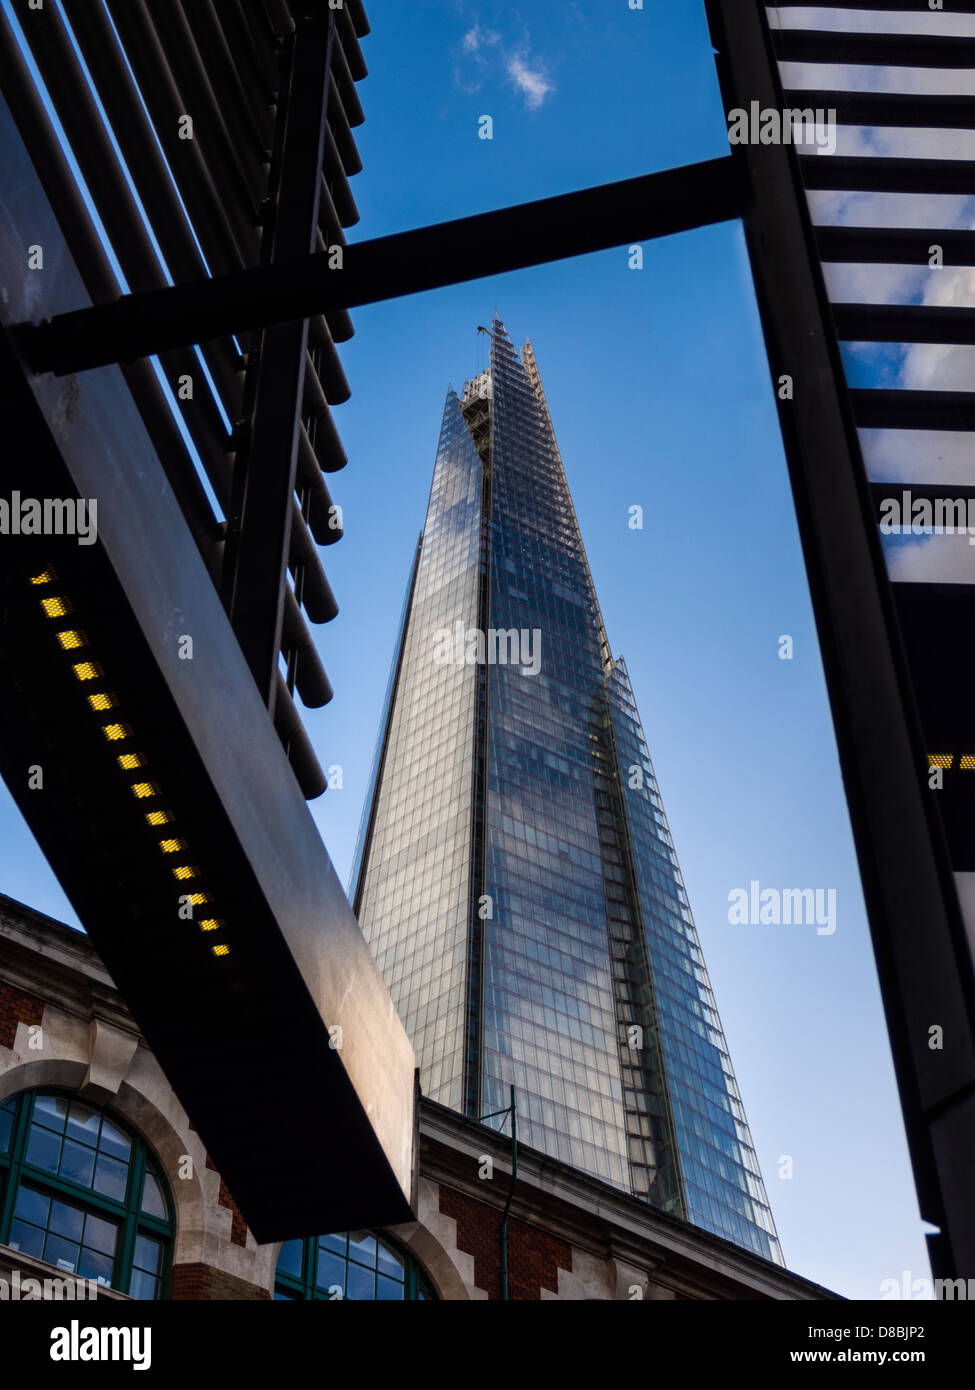 England, London, London Bridge Quater. The Shard Glass towerdesigned by renzo Piano - Stock Image